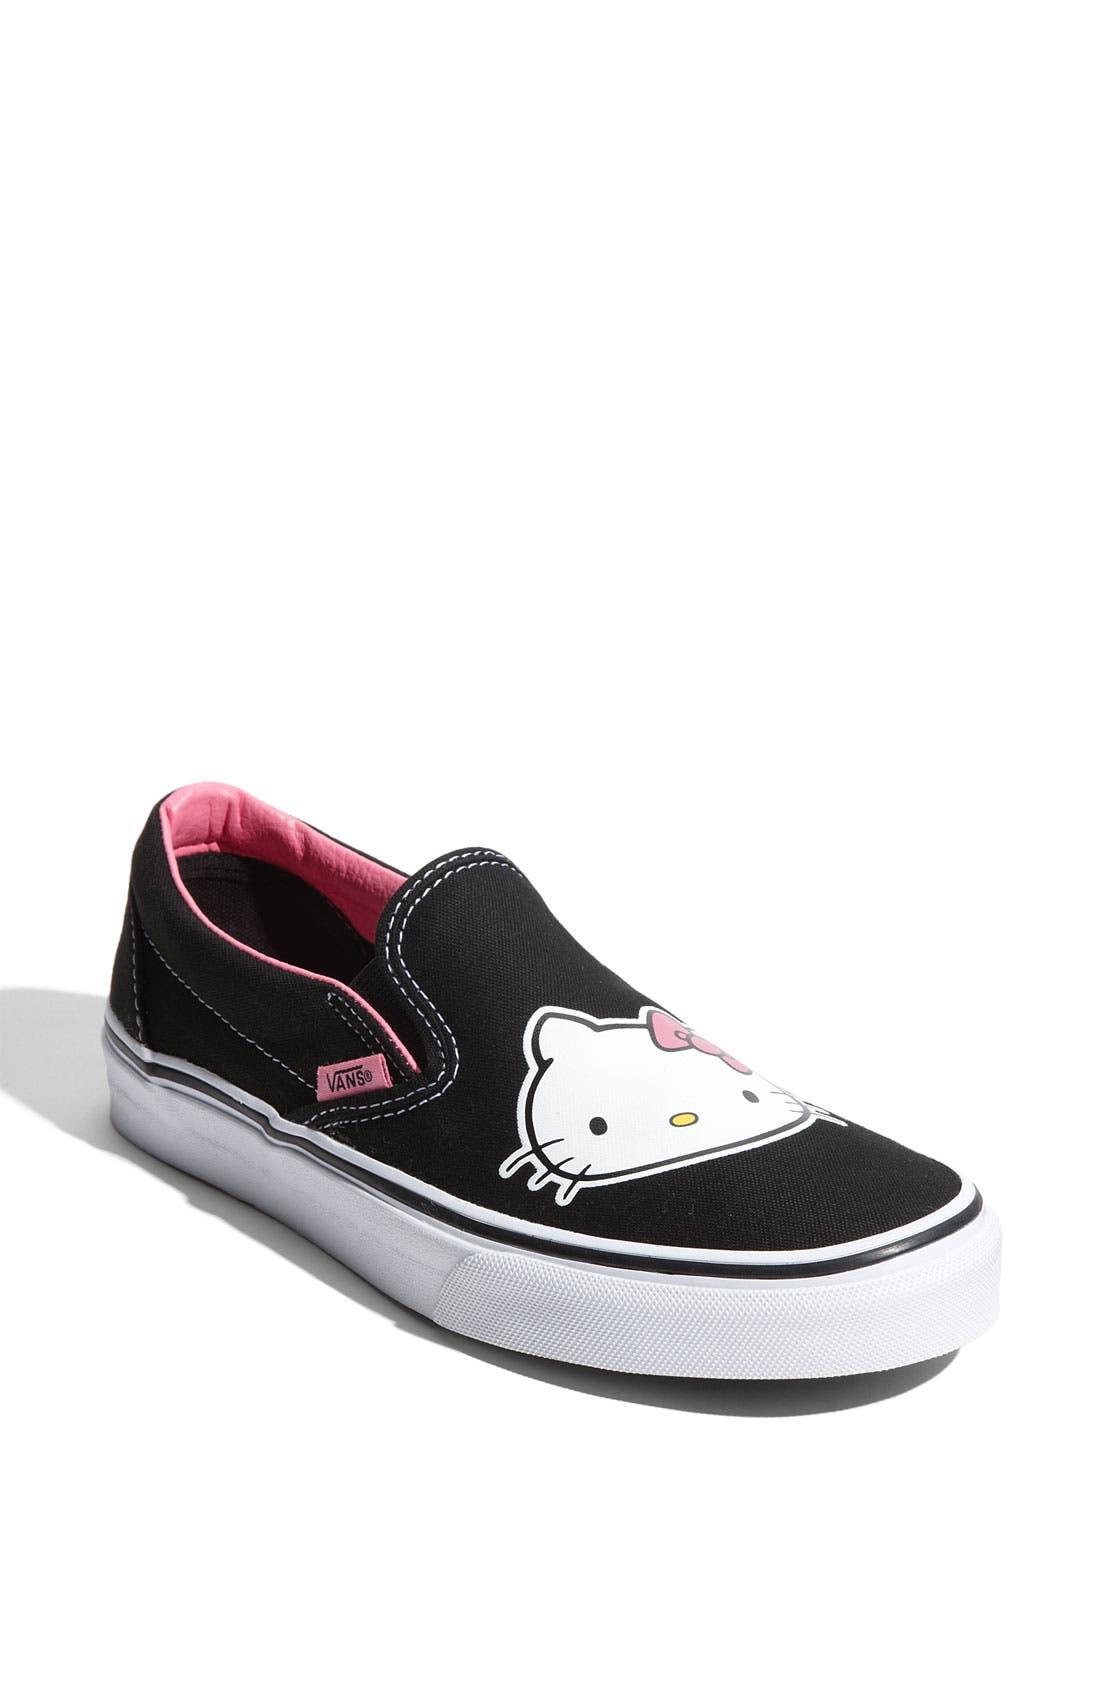 Main Image - Vans 'Hello Kitty®' Slip-On Sneaker (Women) (Limited Edition)